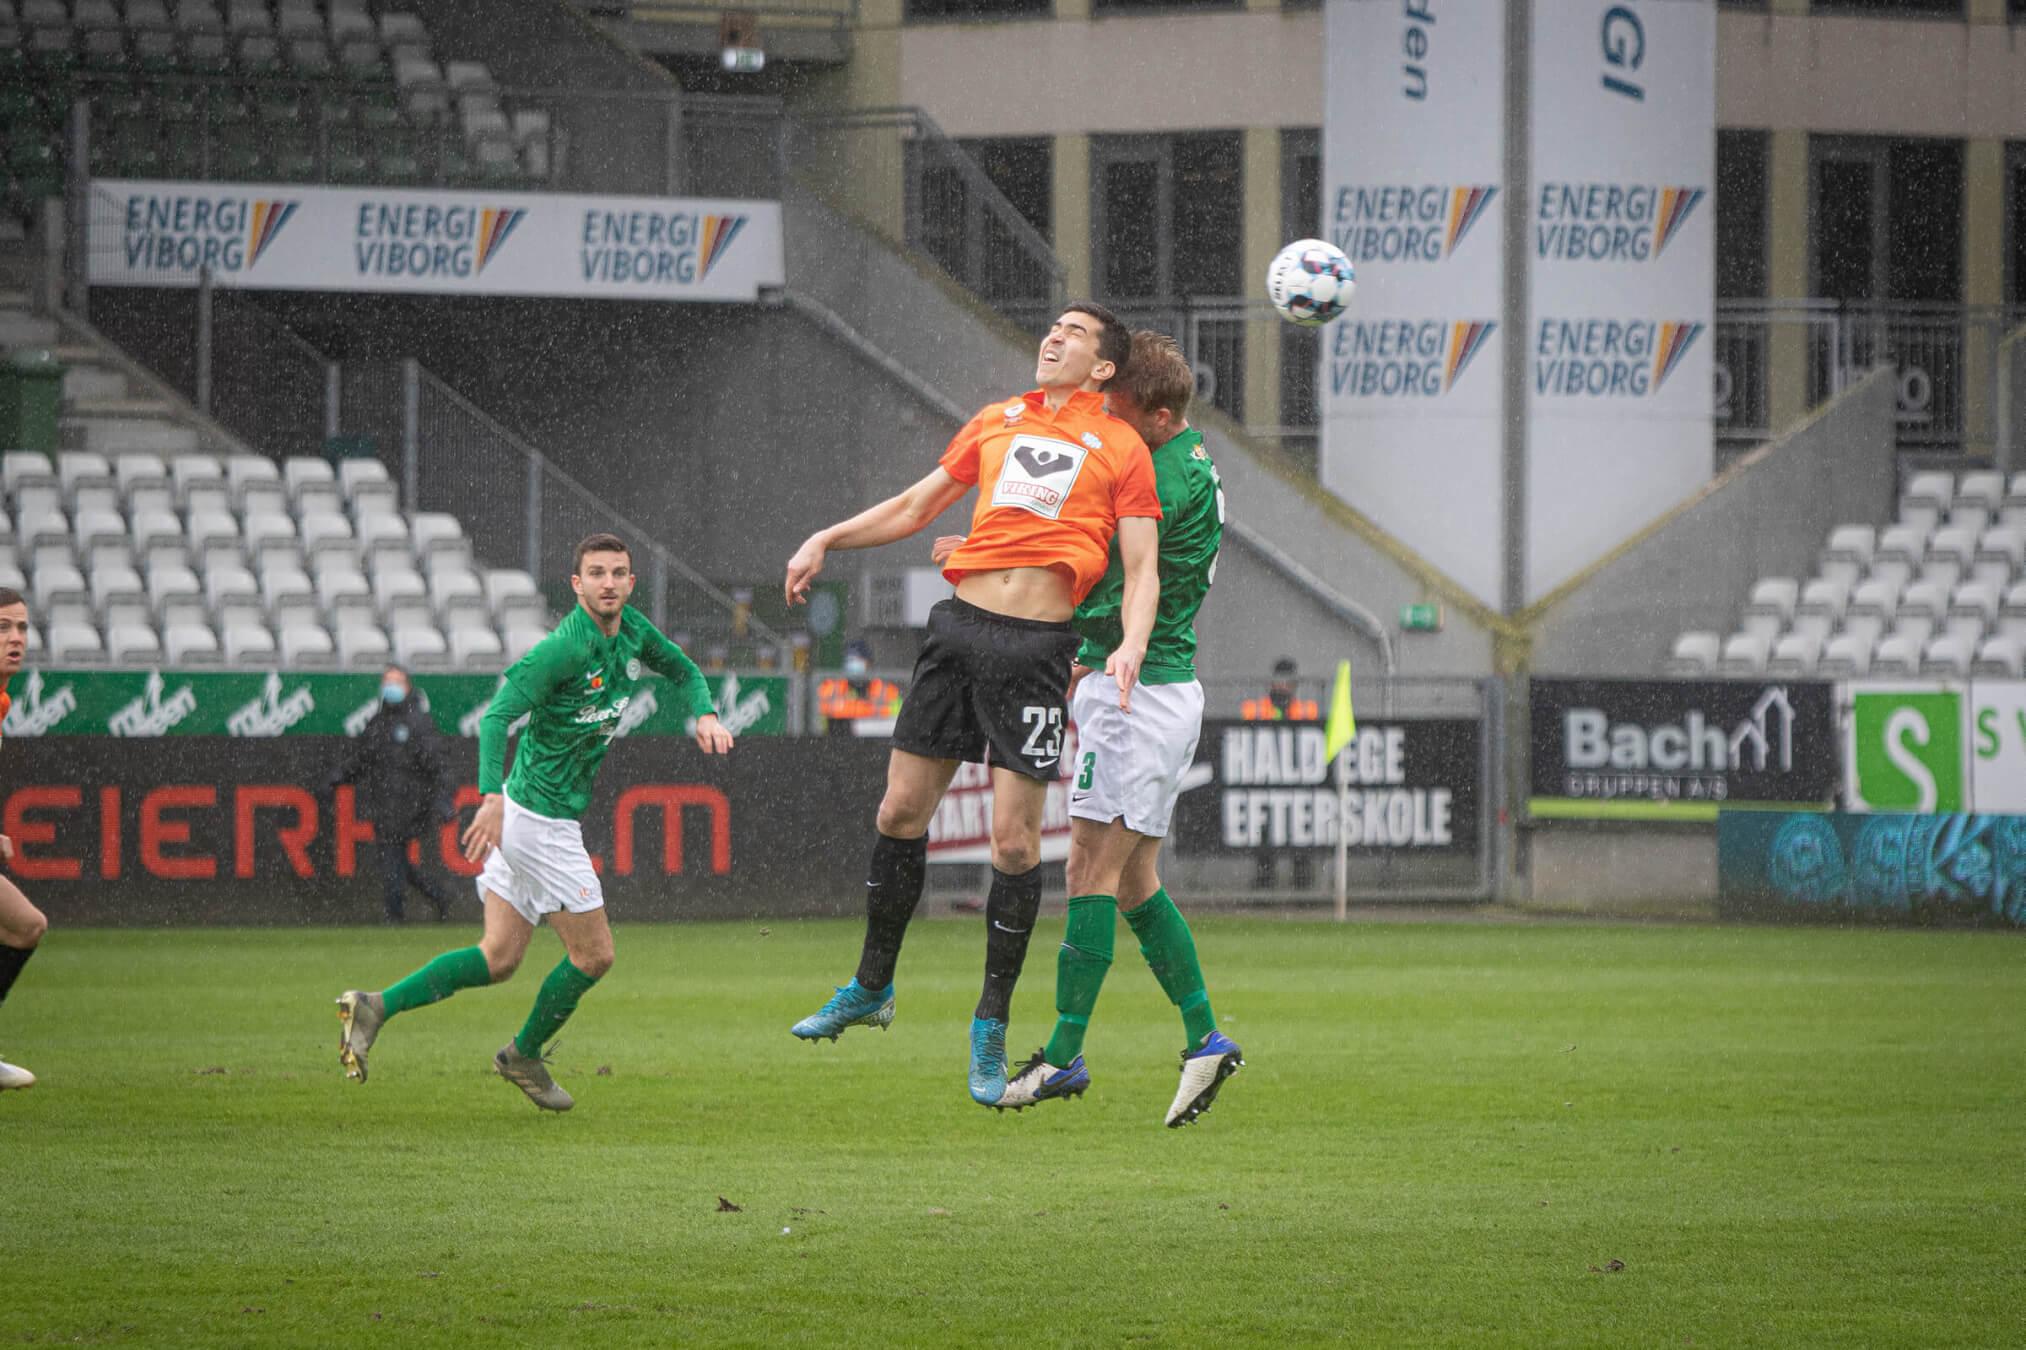 Højdepunkter: Viborg – EfB